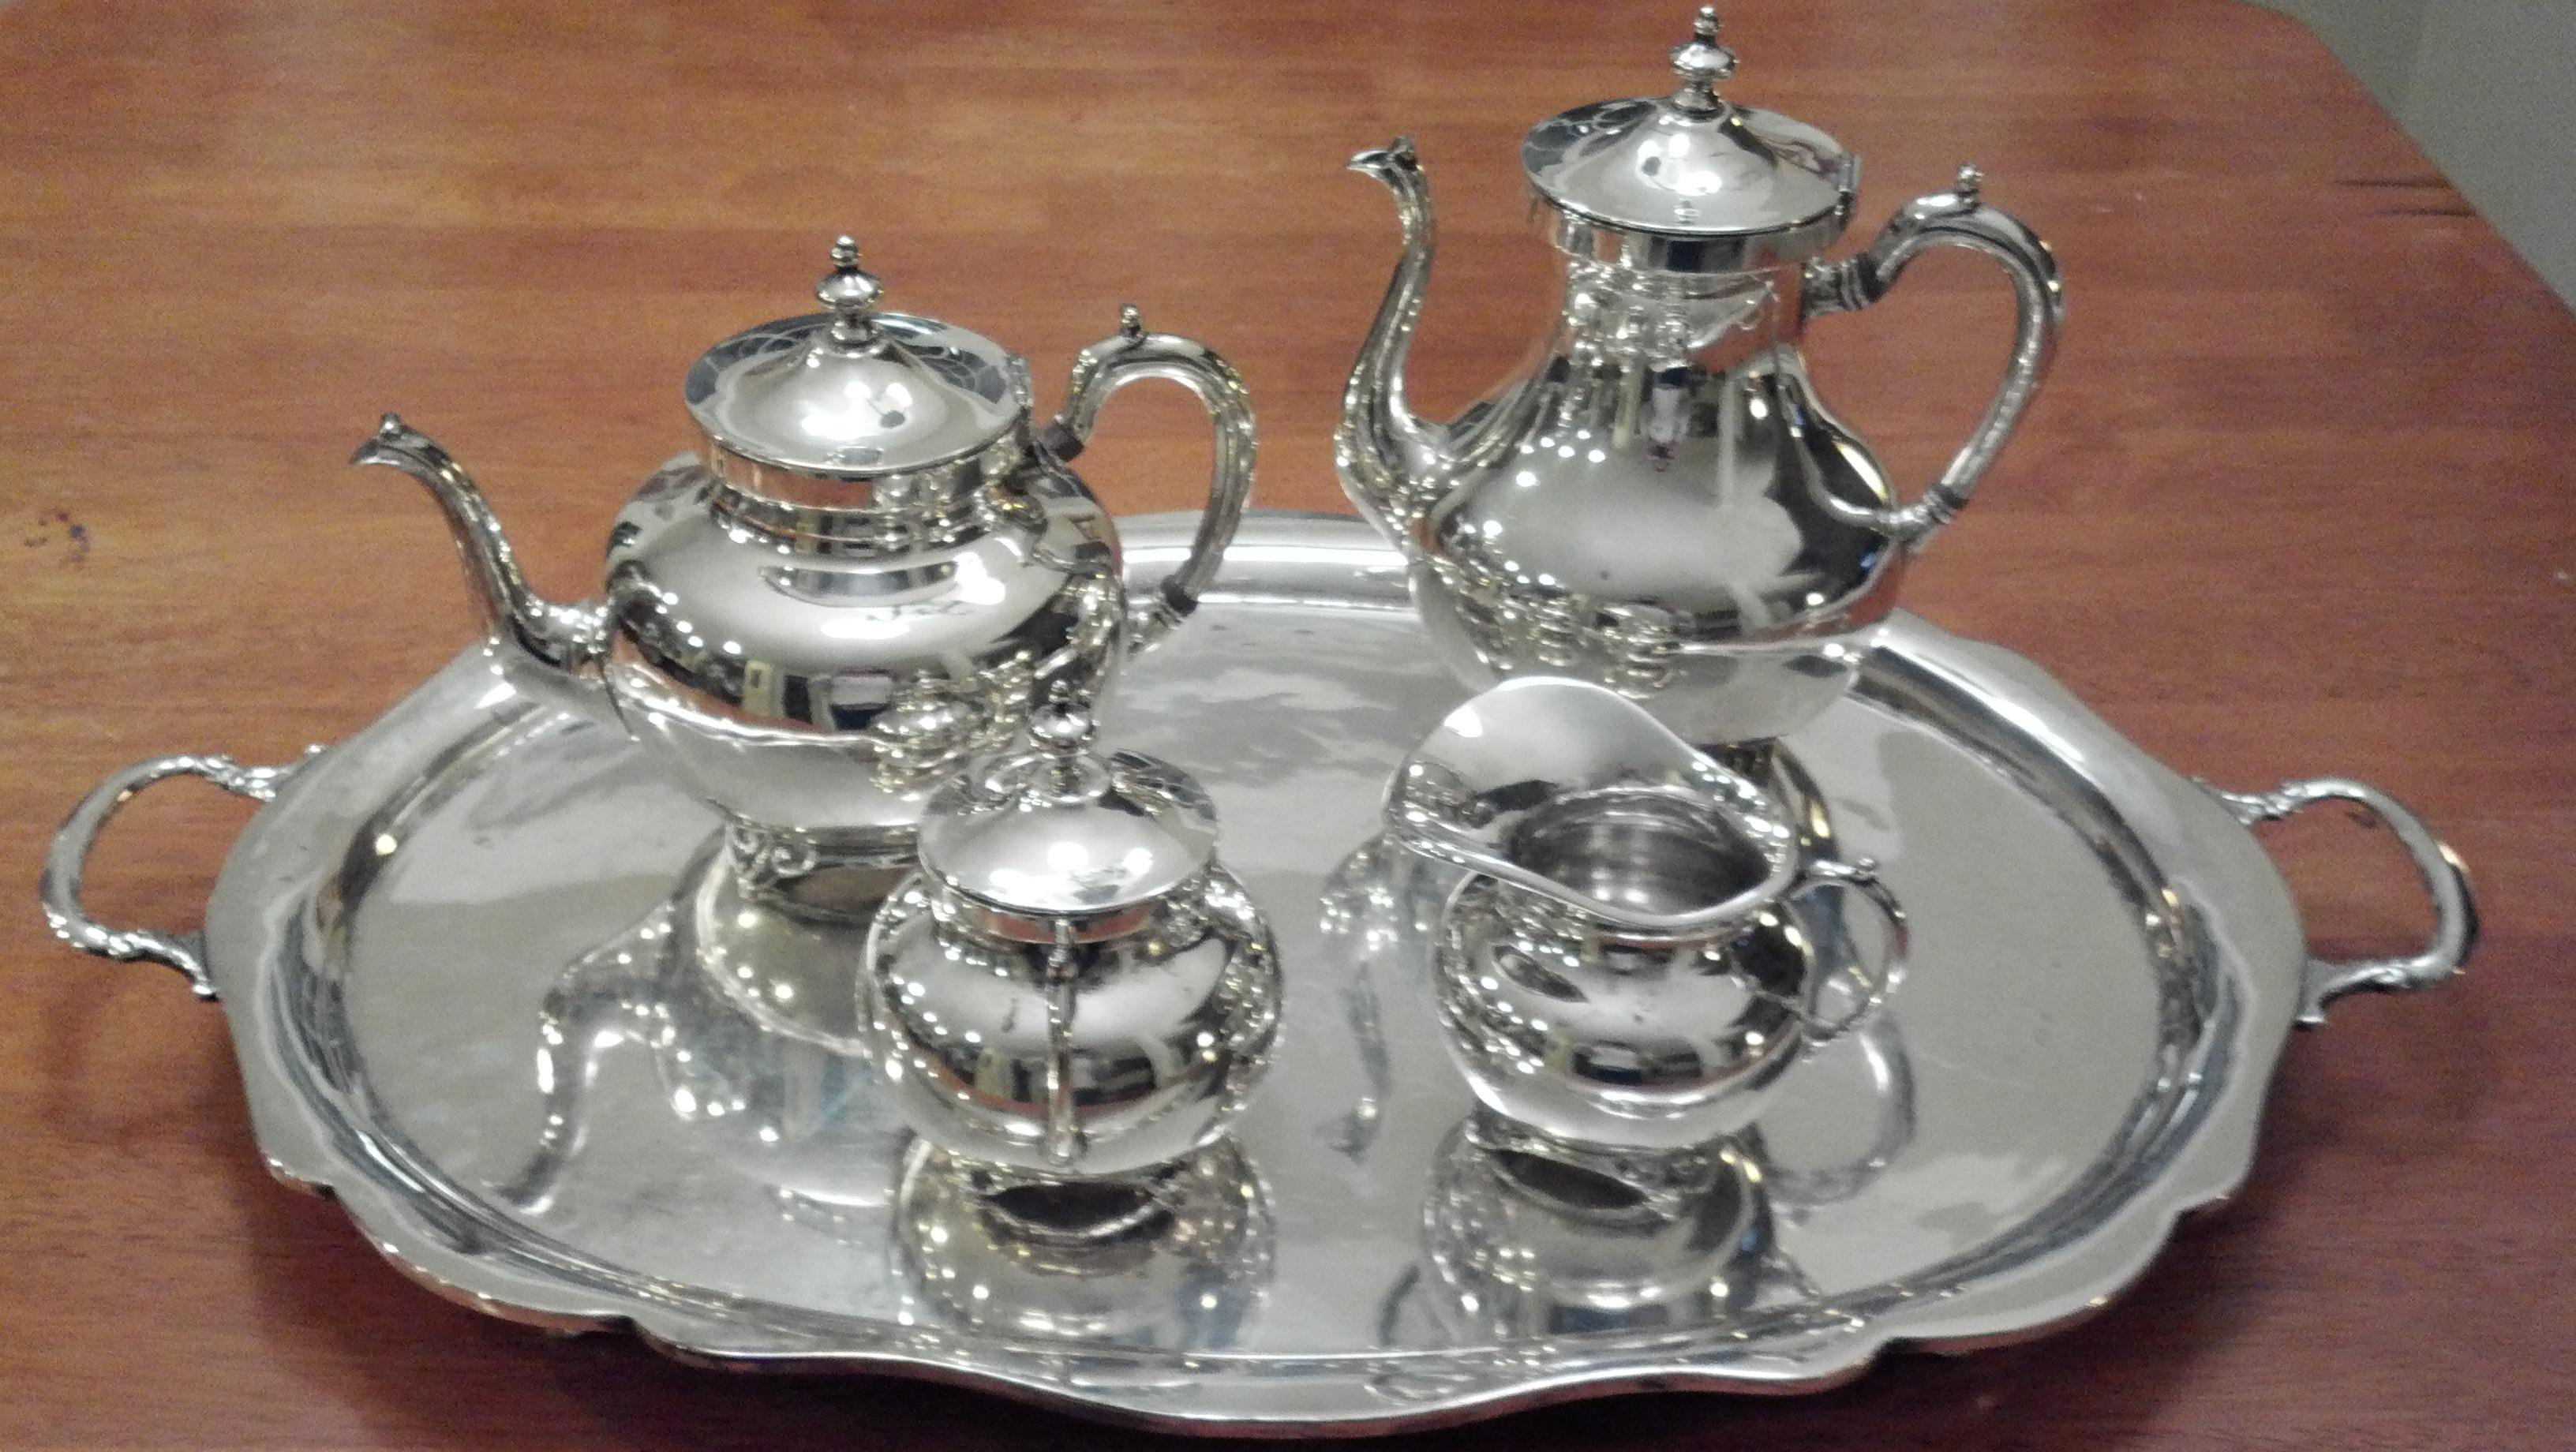 & Buying Sterling Silverware and Tableware